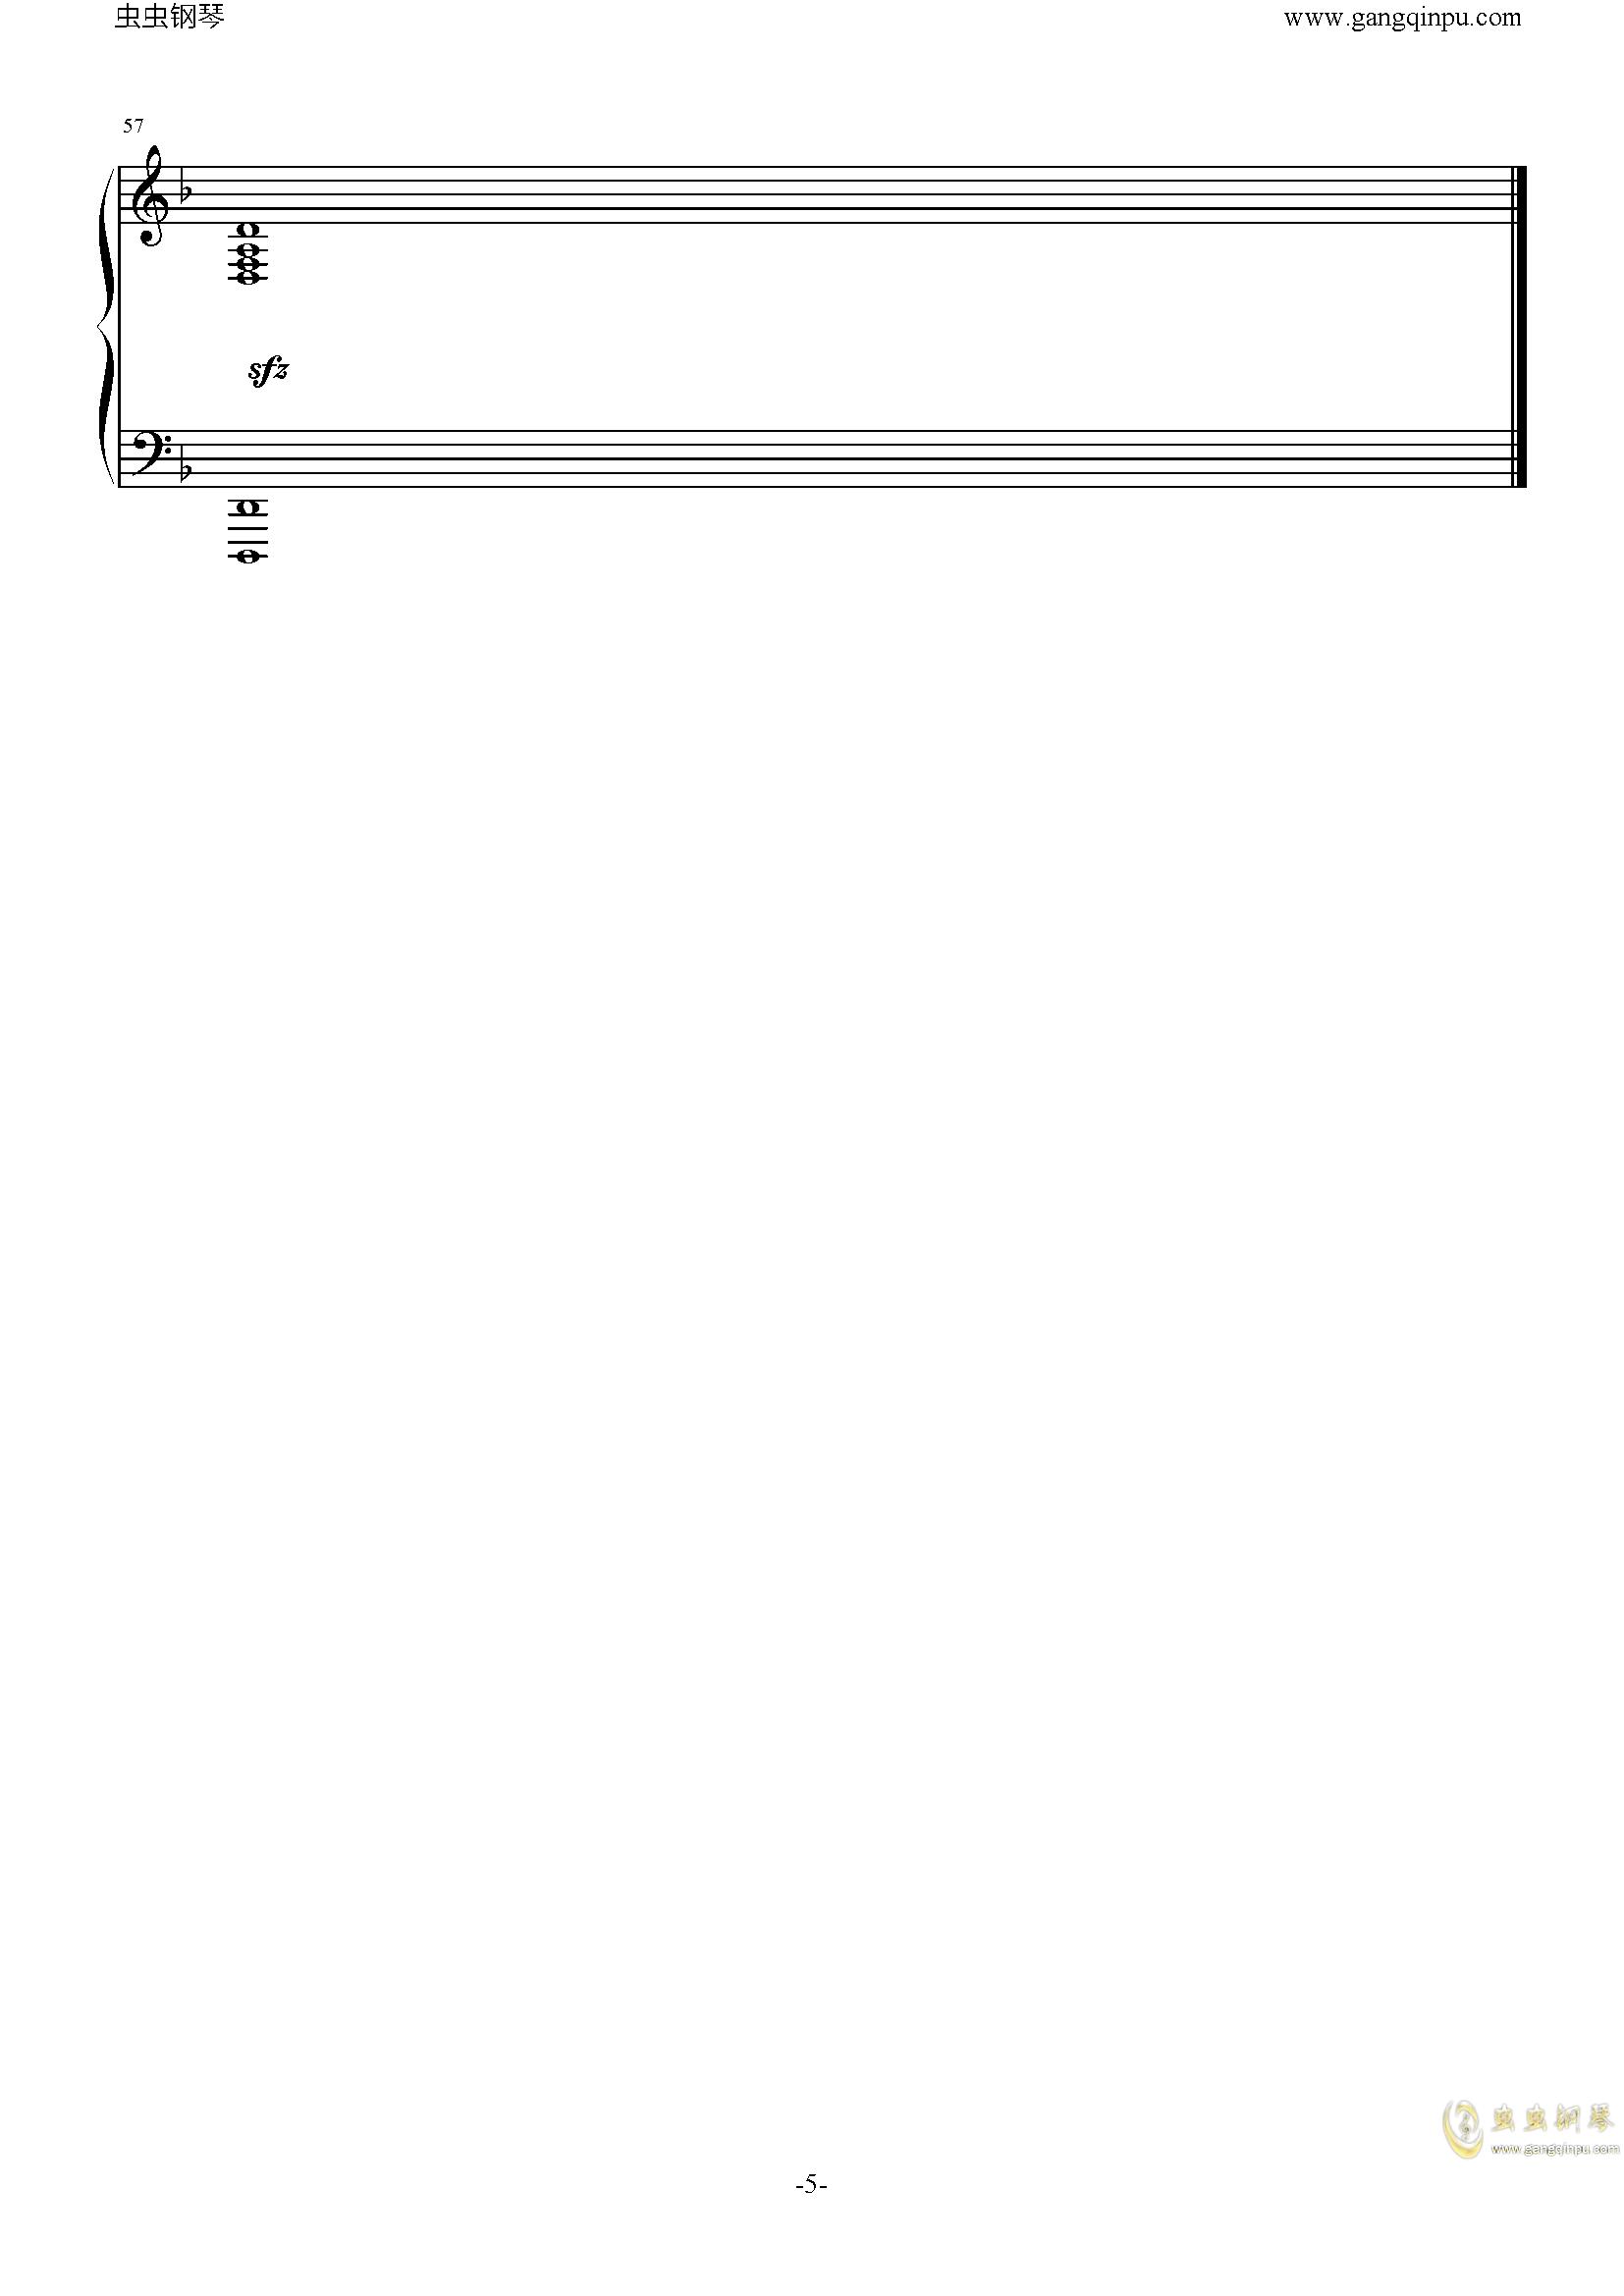 Archangel钢琴谱 第5页